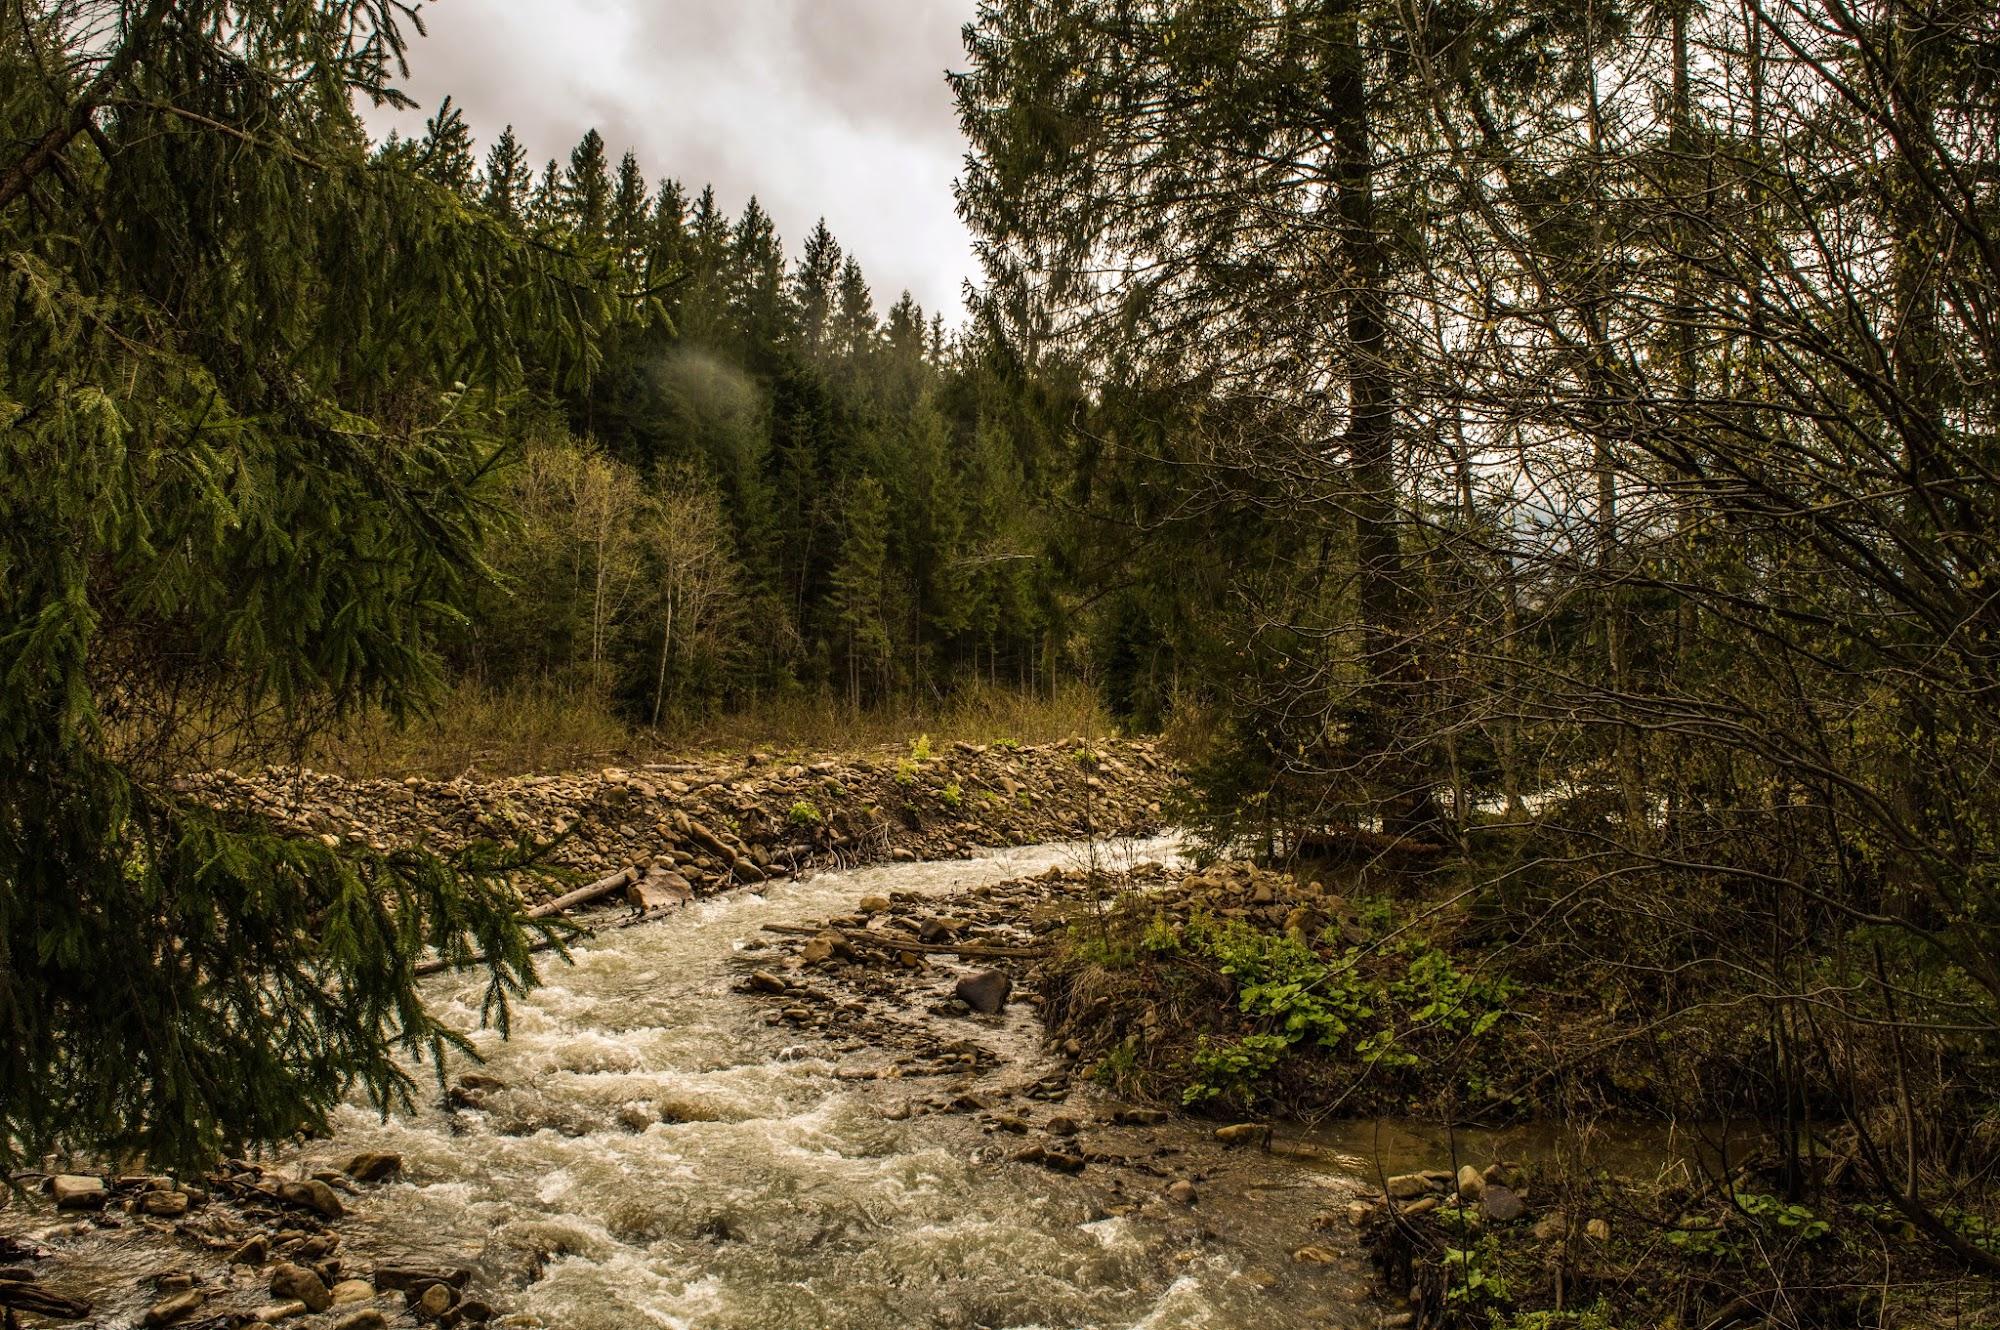 річка Котелець